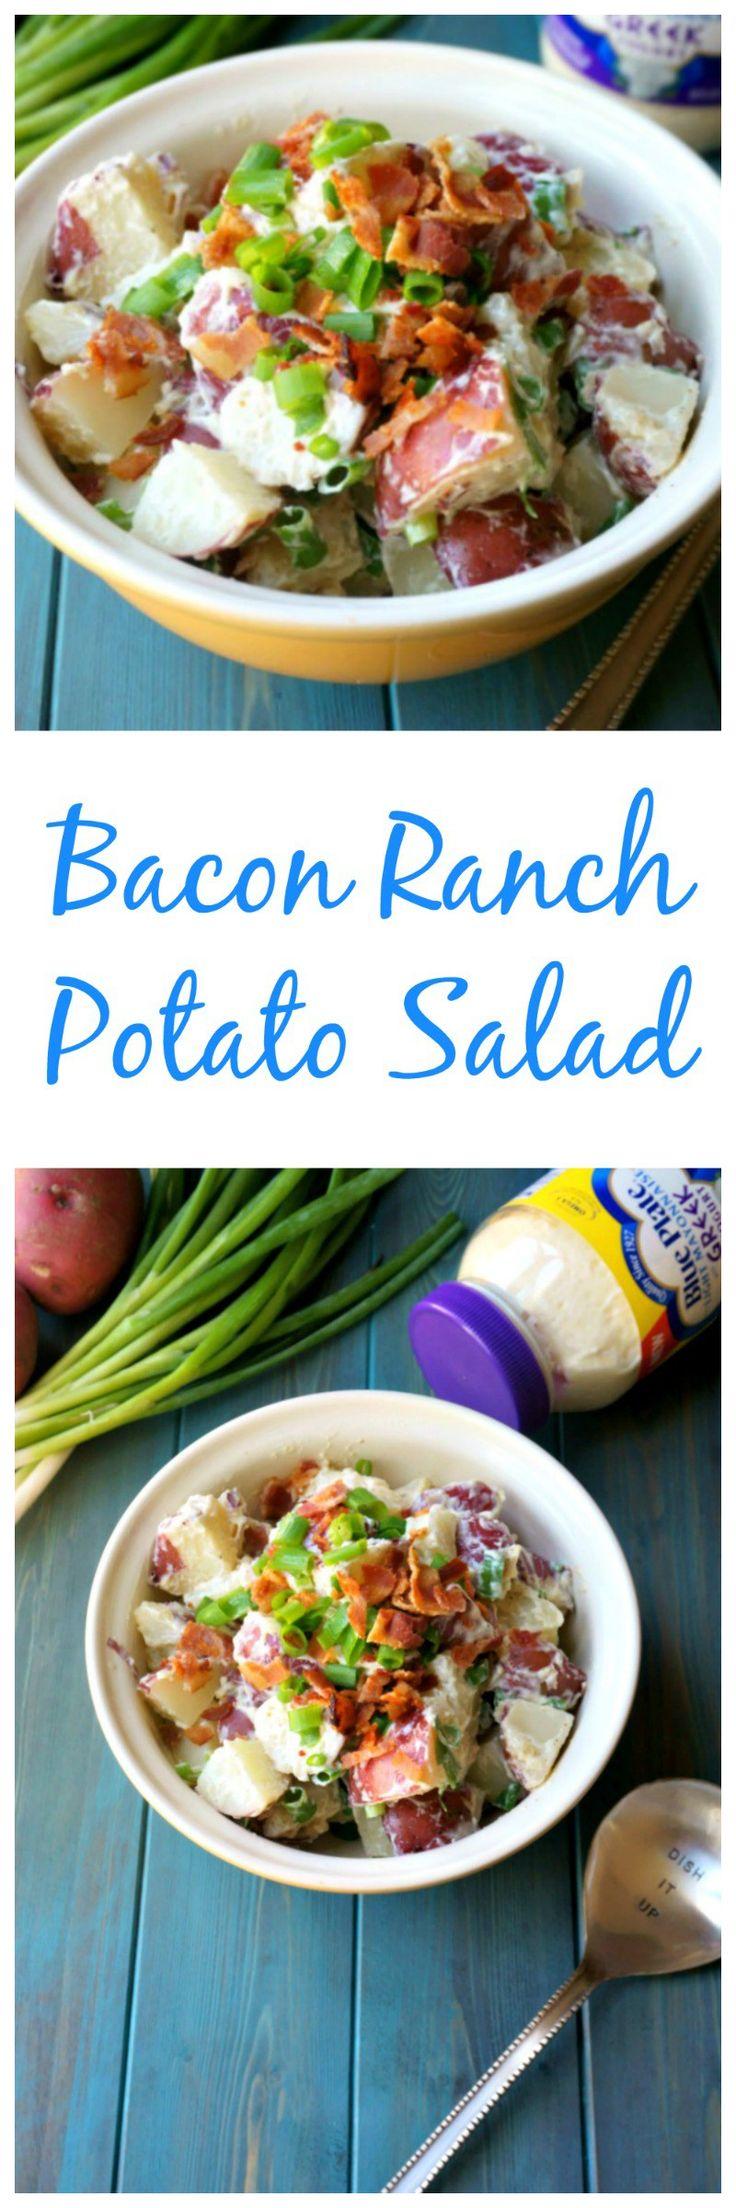 Bacon ranch potato salad red potatoes crispy bacon